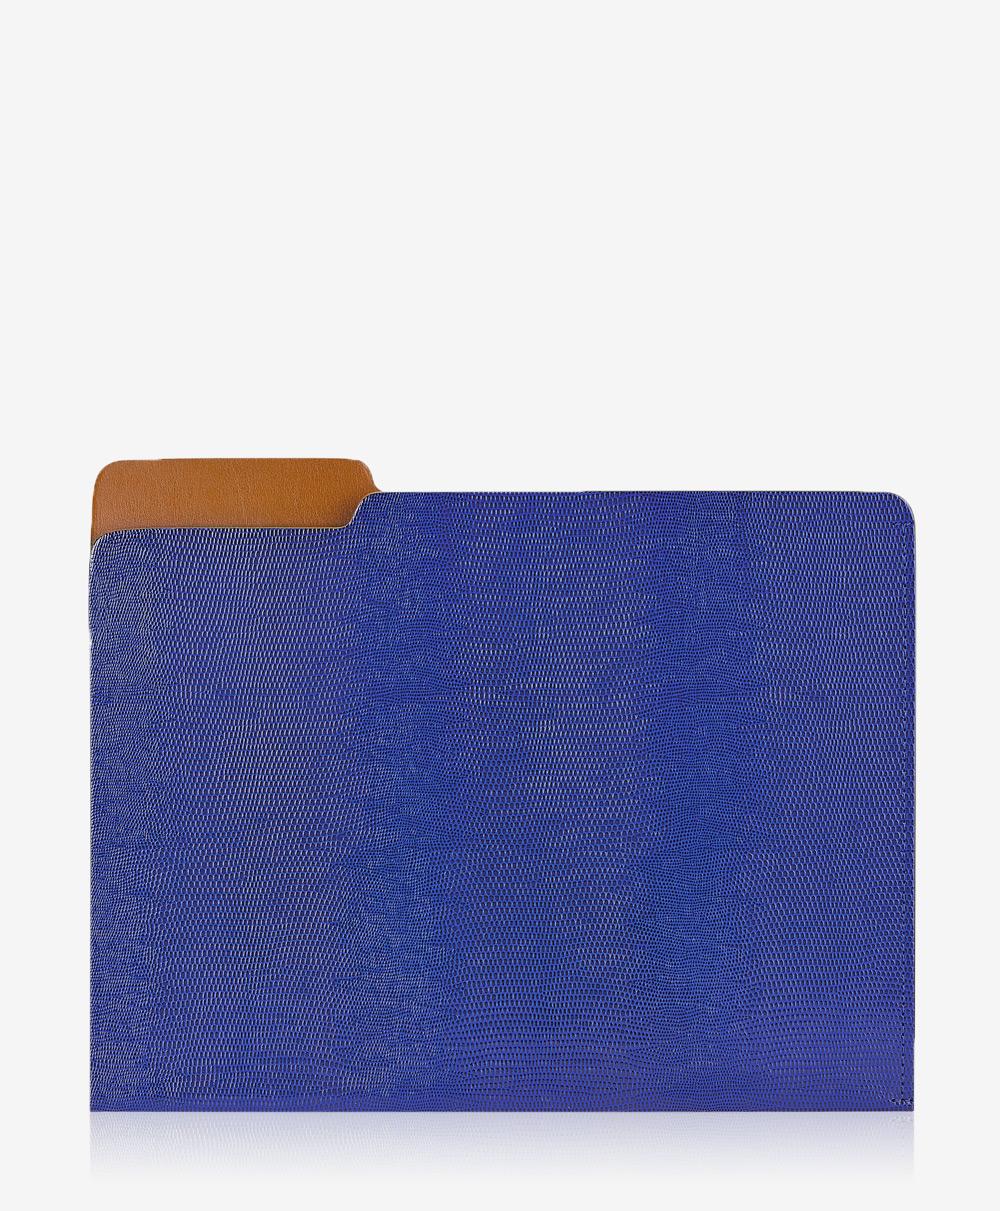 Carlo File Folder Blue Embossed CAR-LIZ-BLU